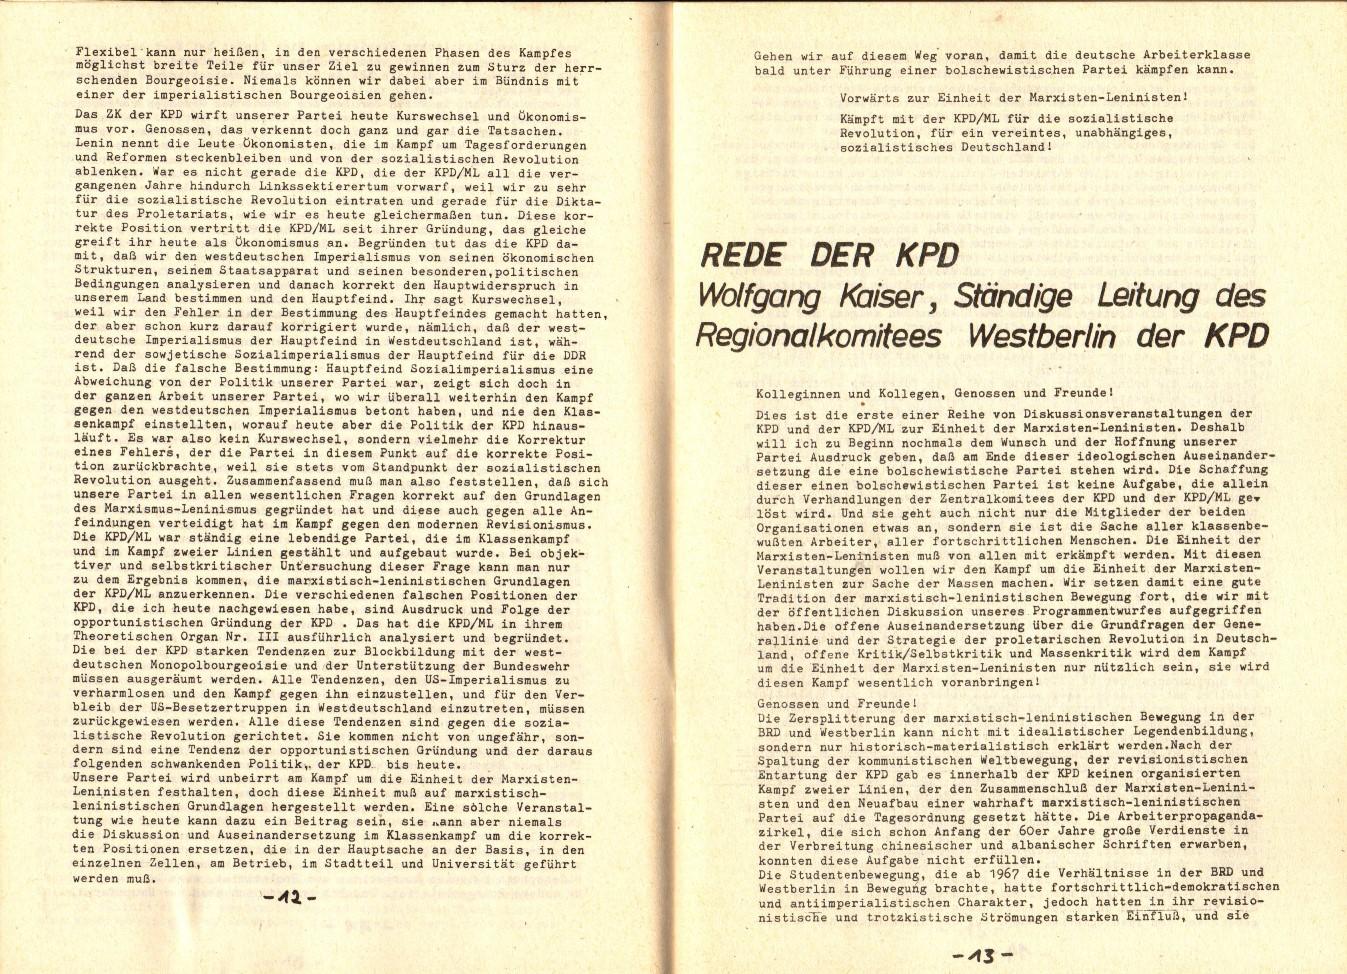 Berlin_AO_1976_Veranstaltung_mit_KPDML_07